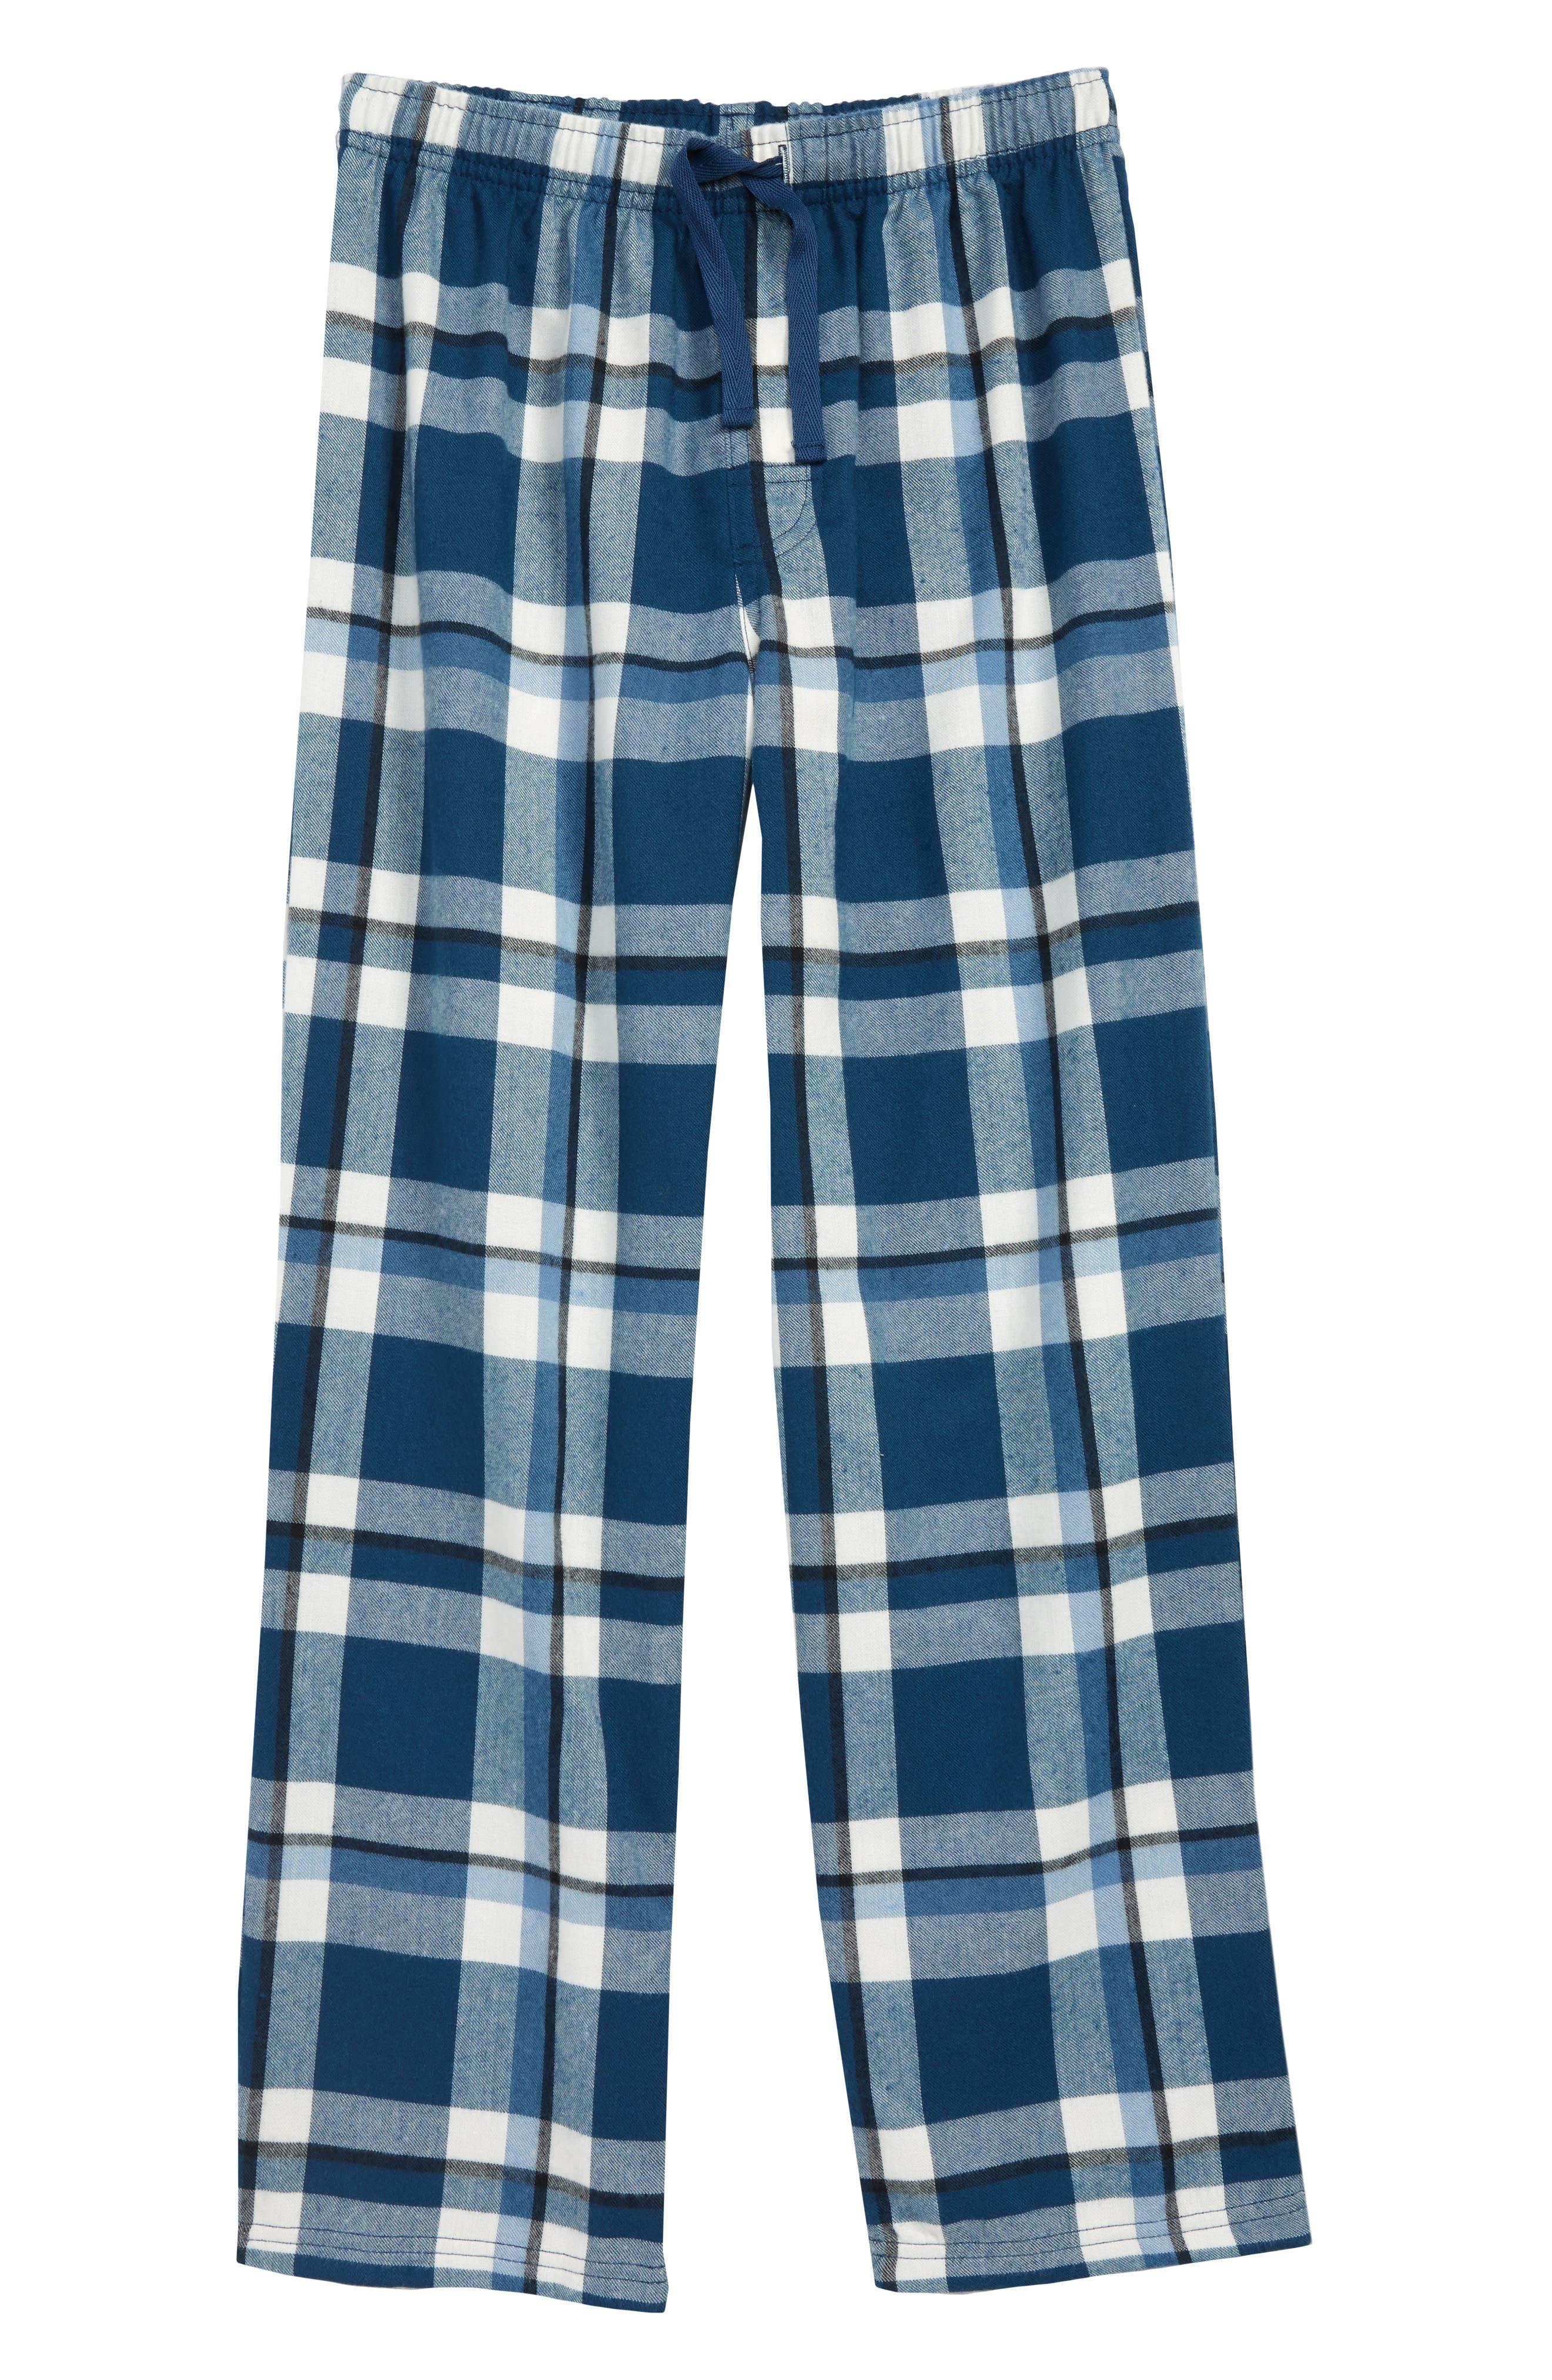 Plaid Flannel Pants,                             Main thumbnail 1, color,                             BLUE WING- IVORY PLAID